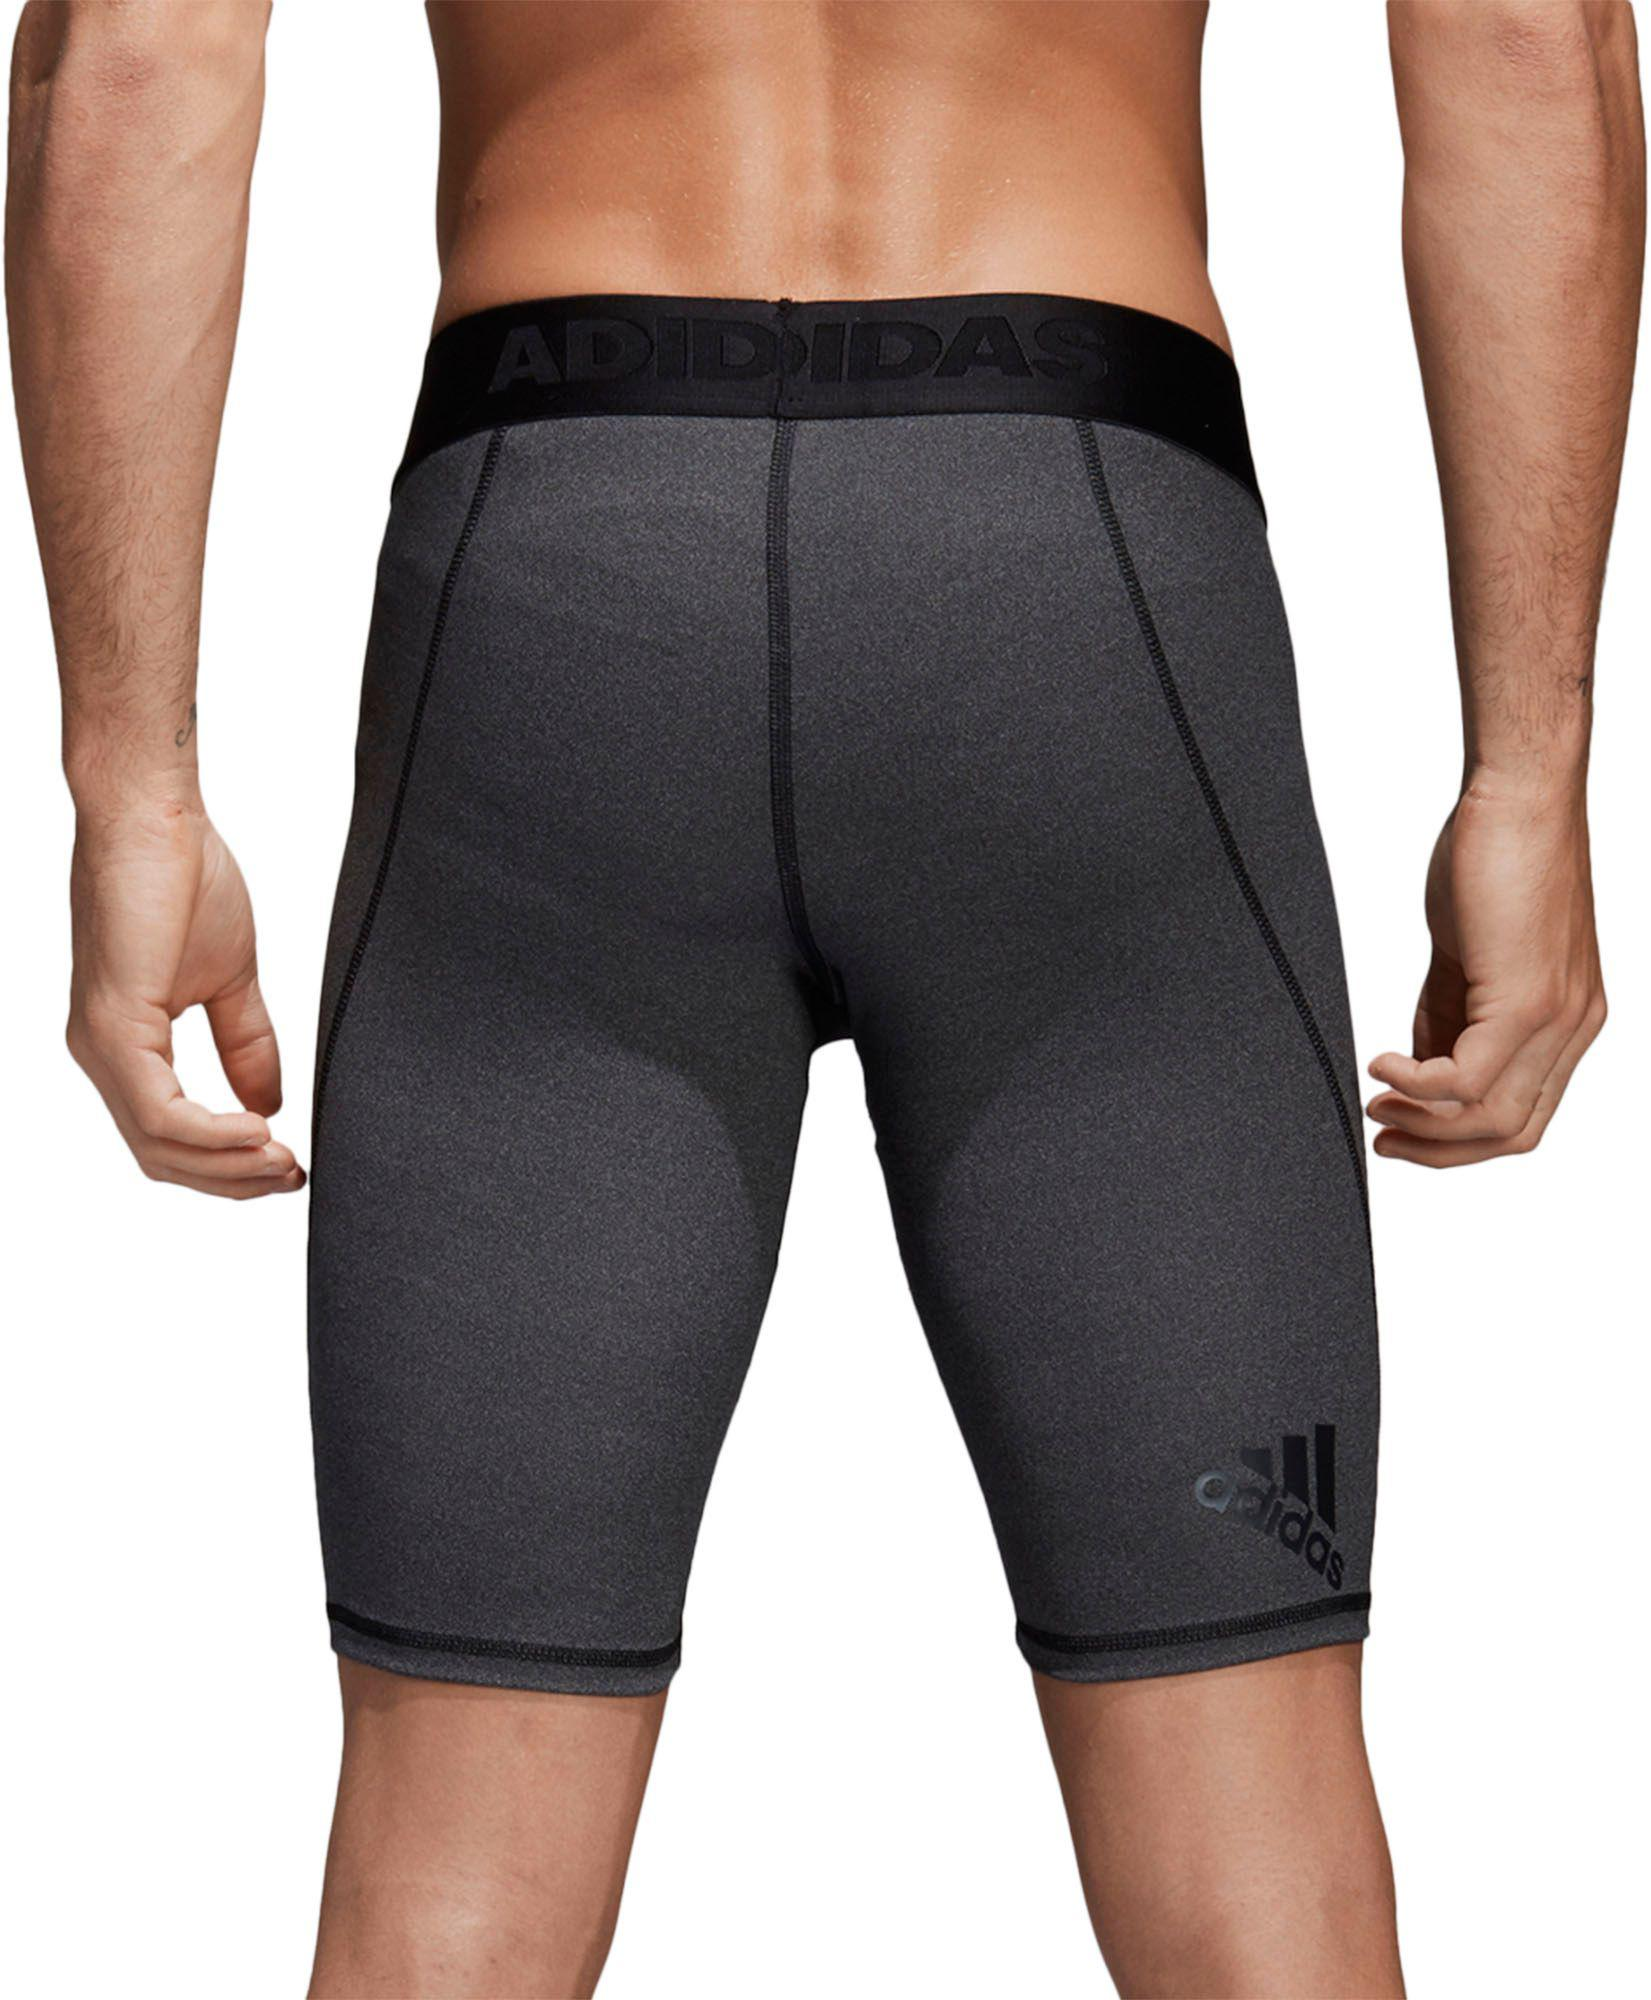 90b5c5b22 Lyst - adidas Alphaskin Sport Training Fitted Shorts in Black for Men